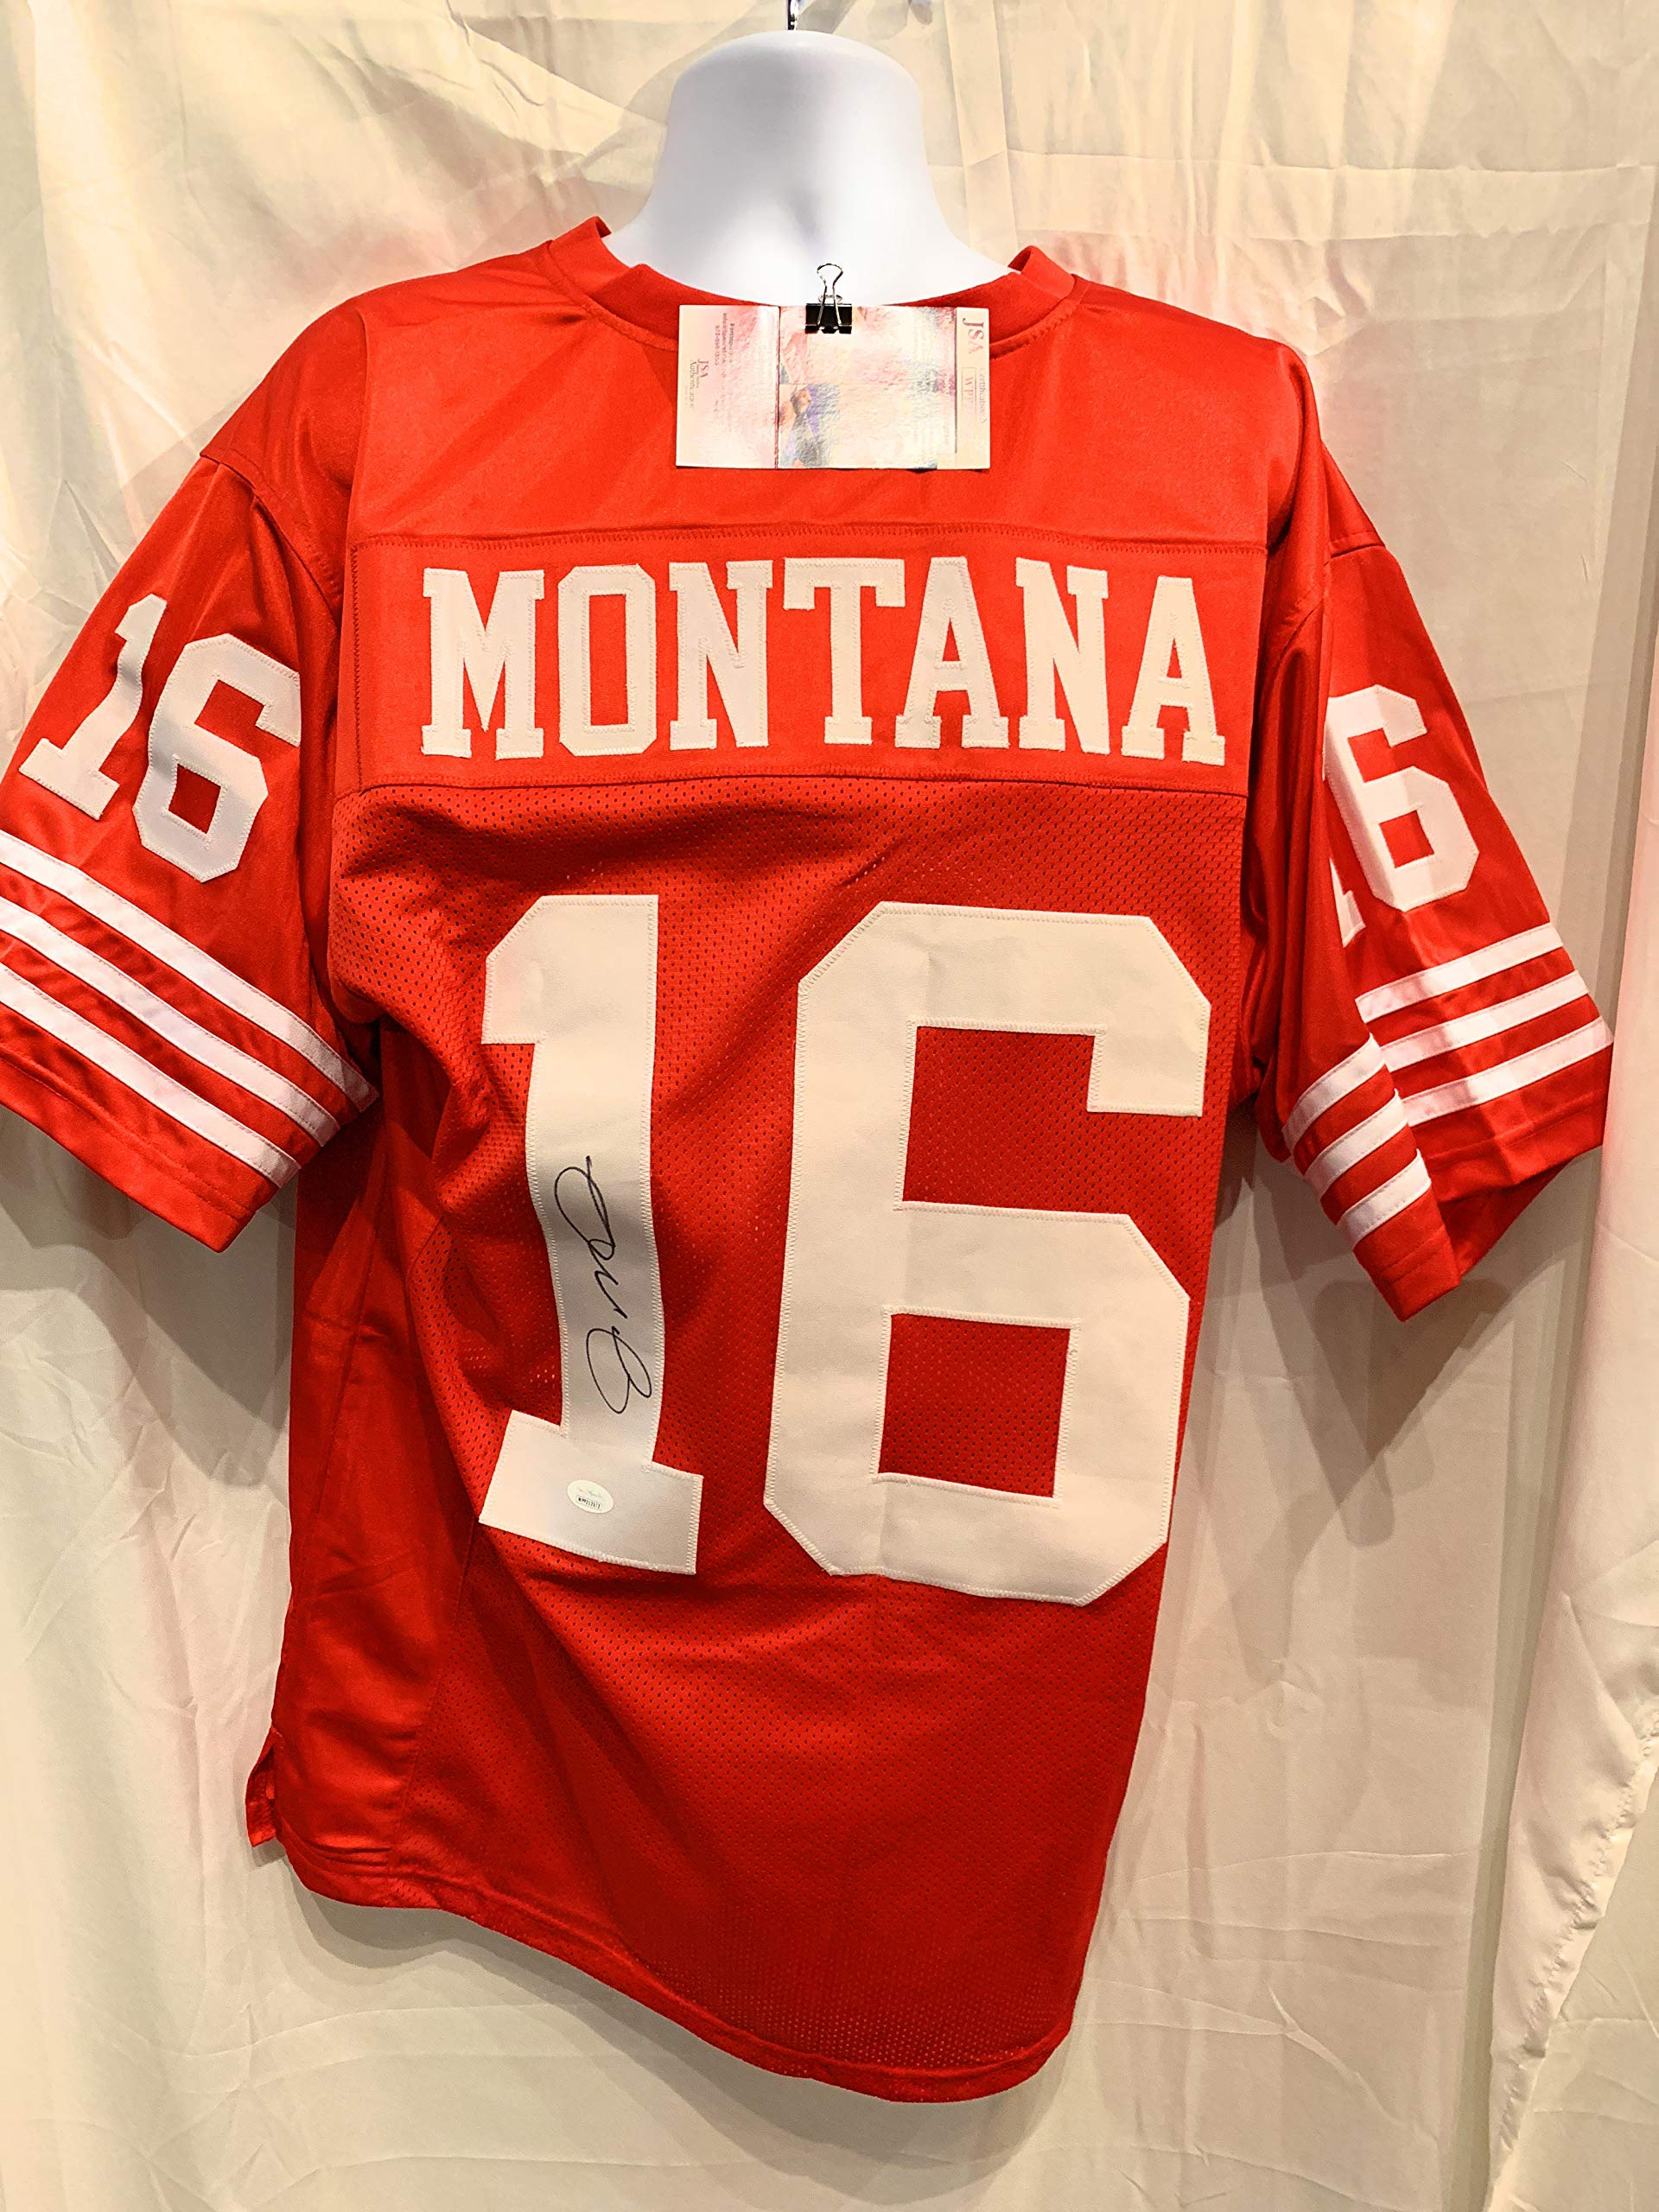 Joe Montana San Fransico 49ers Signed Autograph Custom Jersey JSA Witnessed Certified